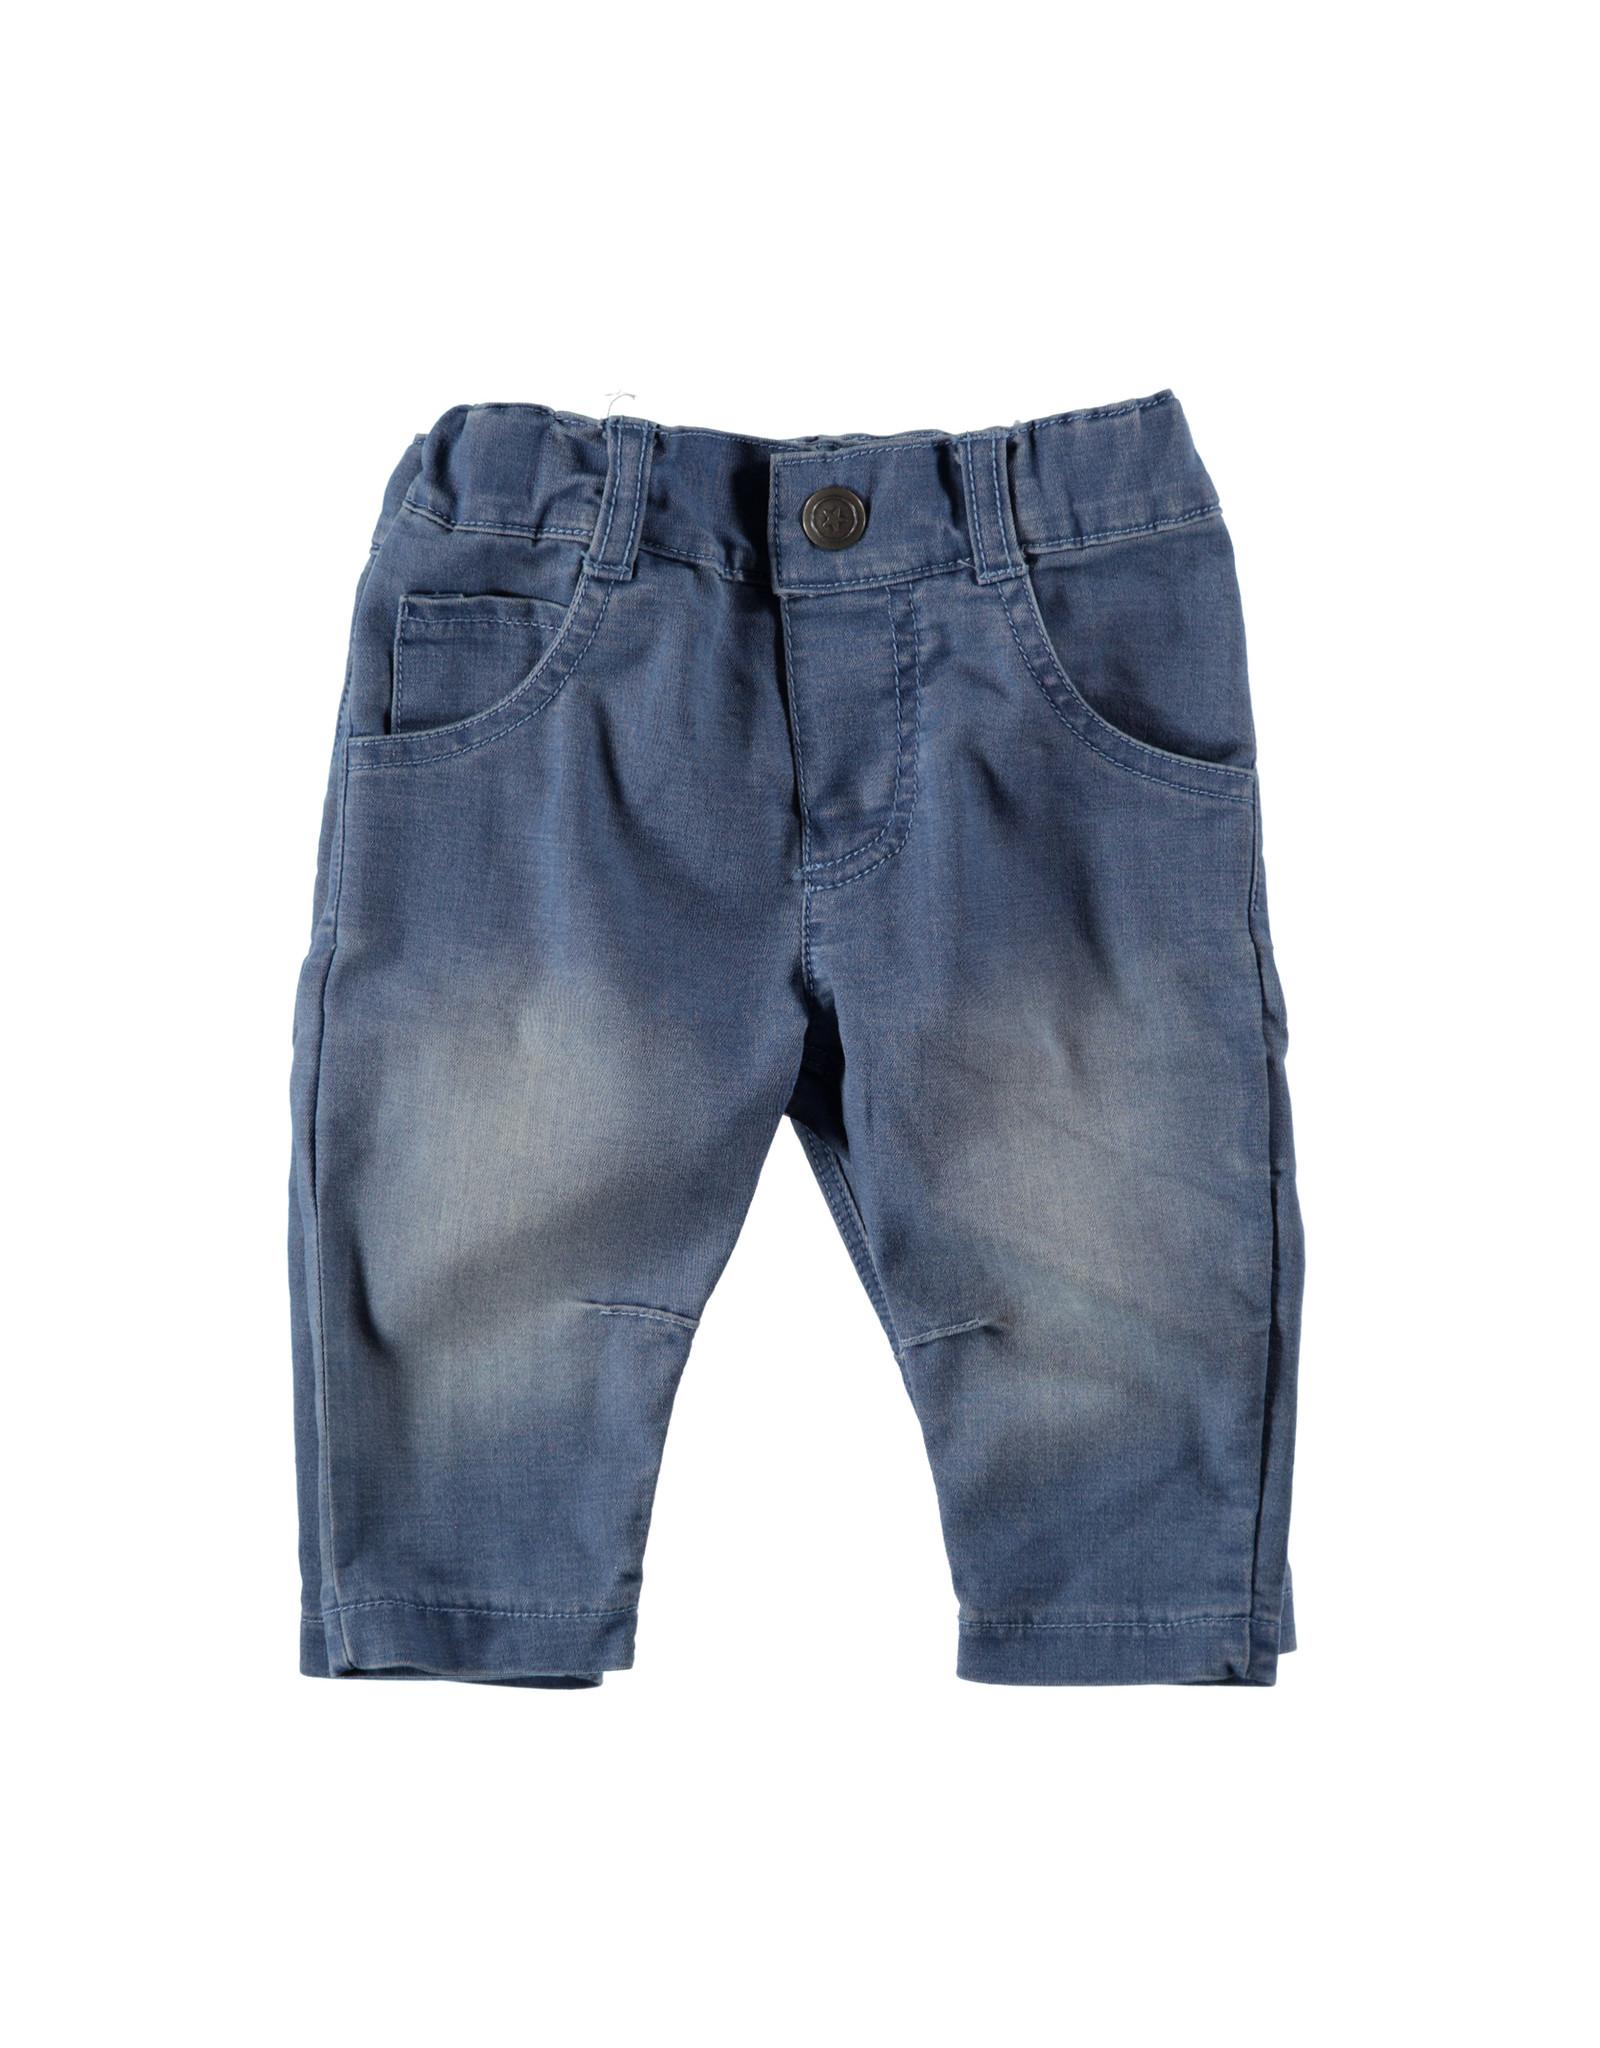 B.E.S.S. Jeans 5-pocket, Light wash